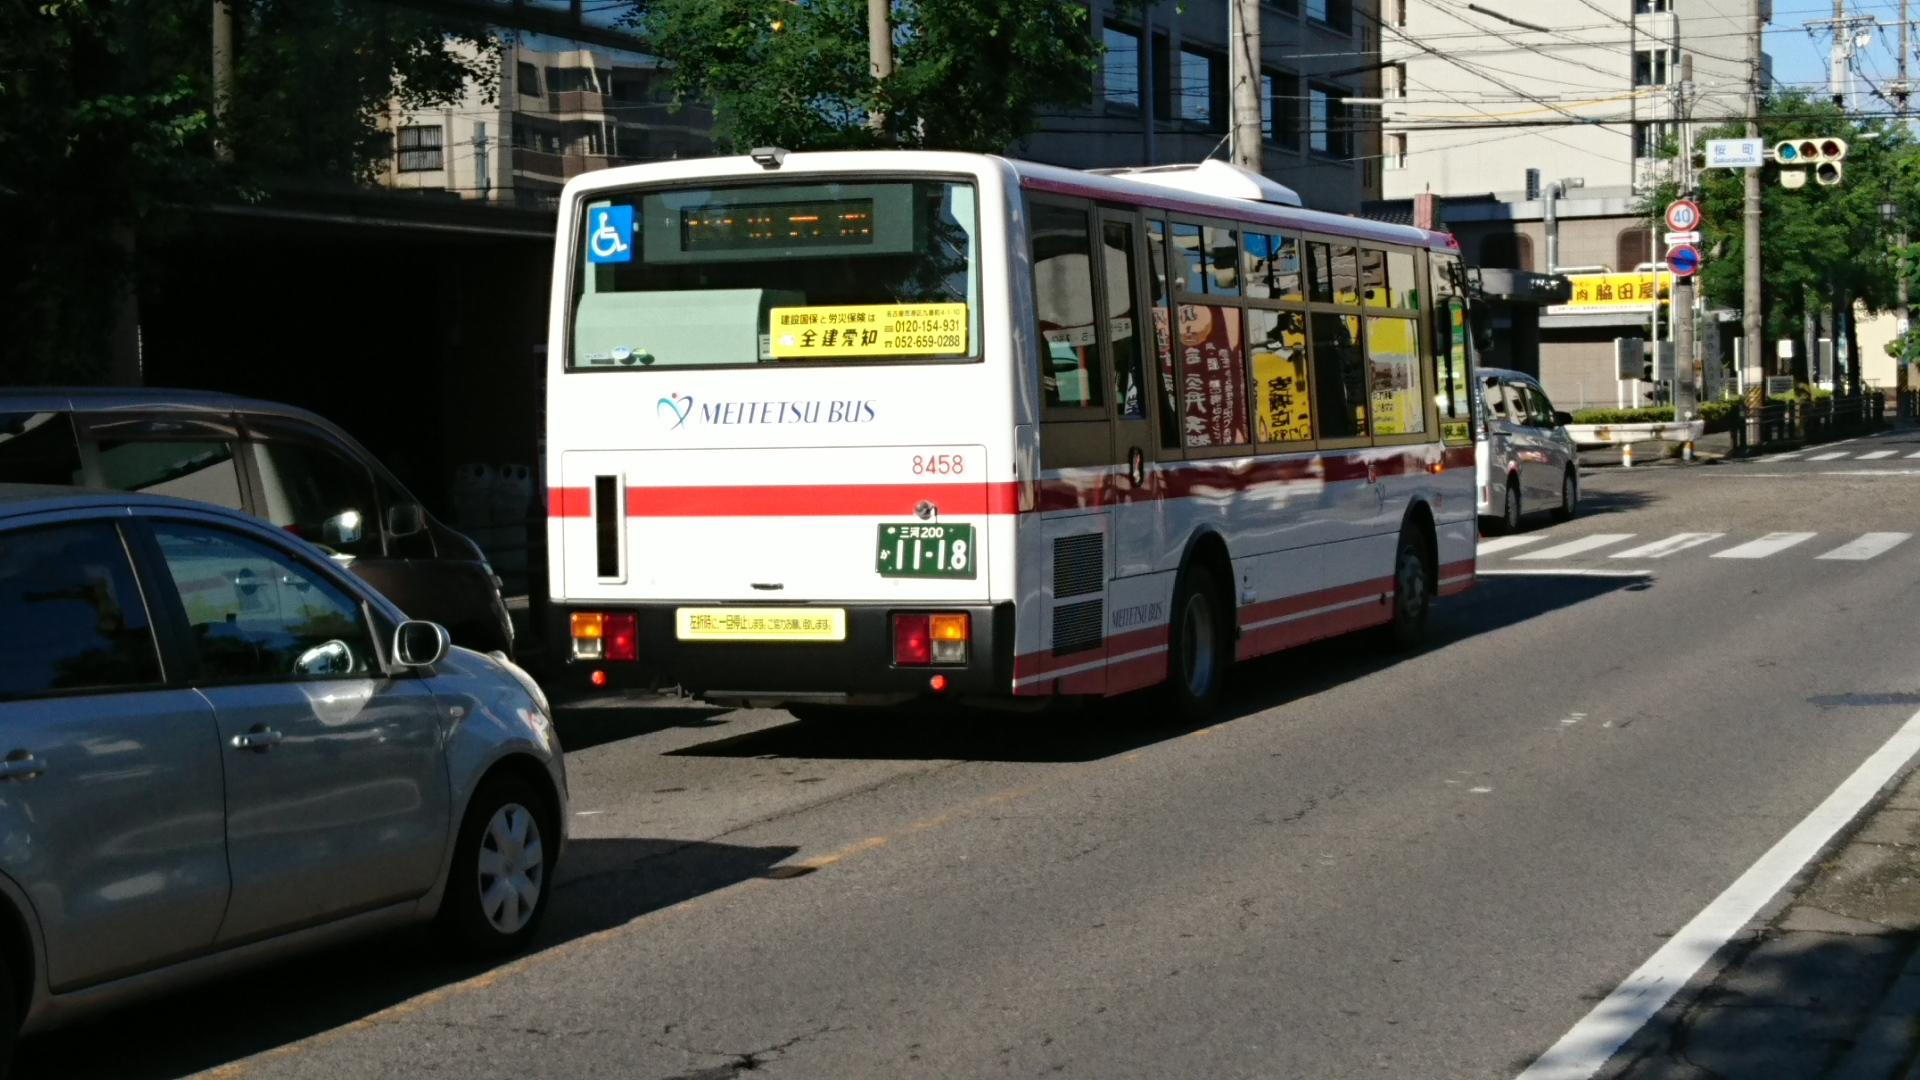 2016.10.18 名鉄バス (6) 桜町交差点 1920-1080